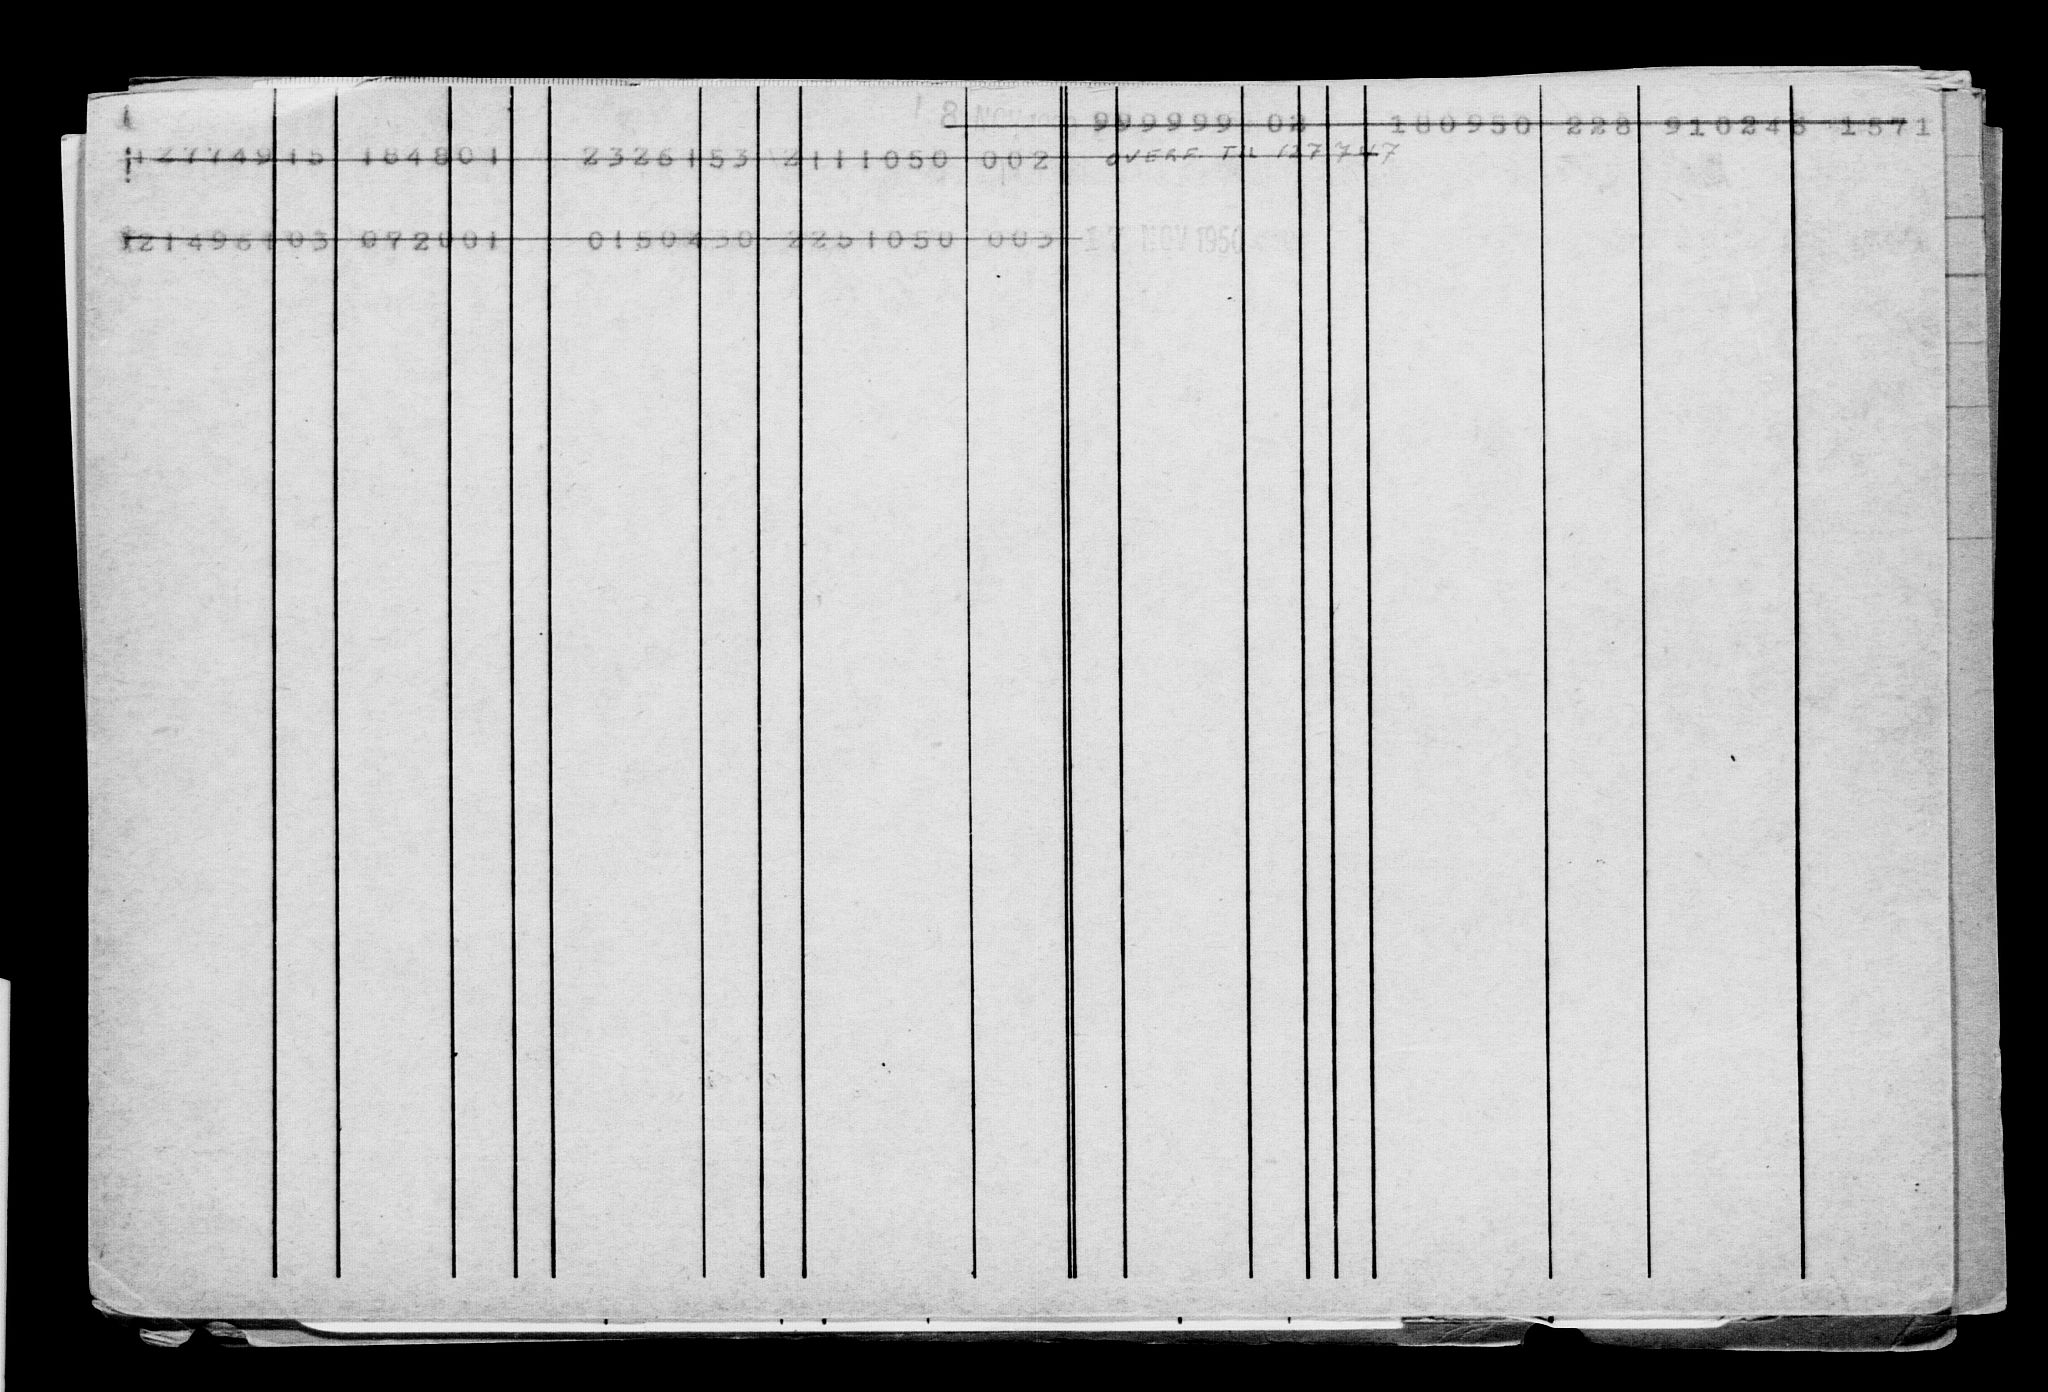 RA, Direktoratet for sjømenn, G/Gb/L0005: Hovedkort, 1888, s. 370